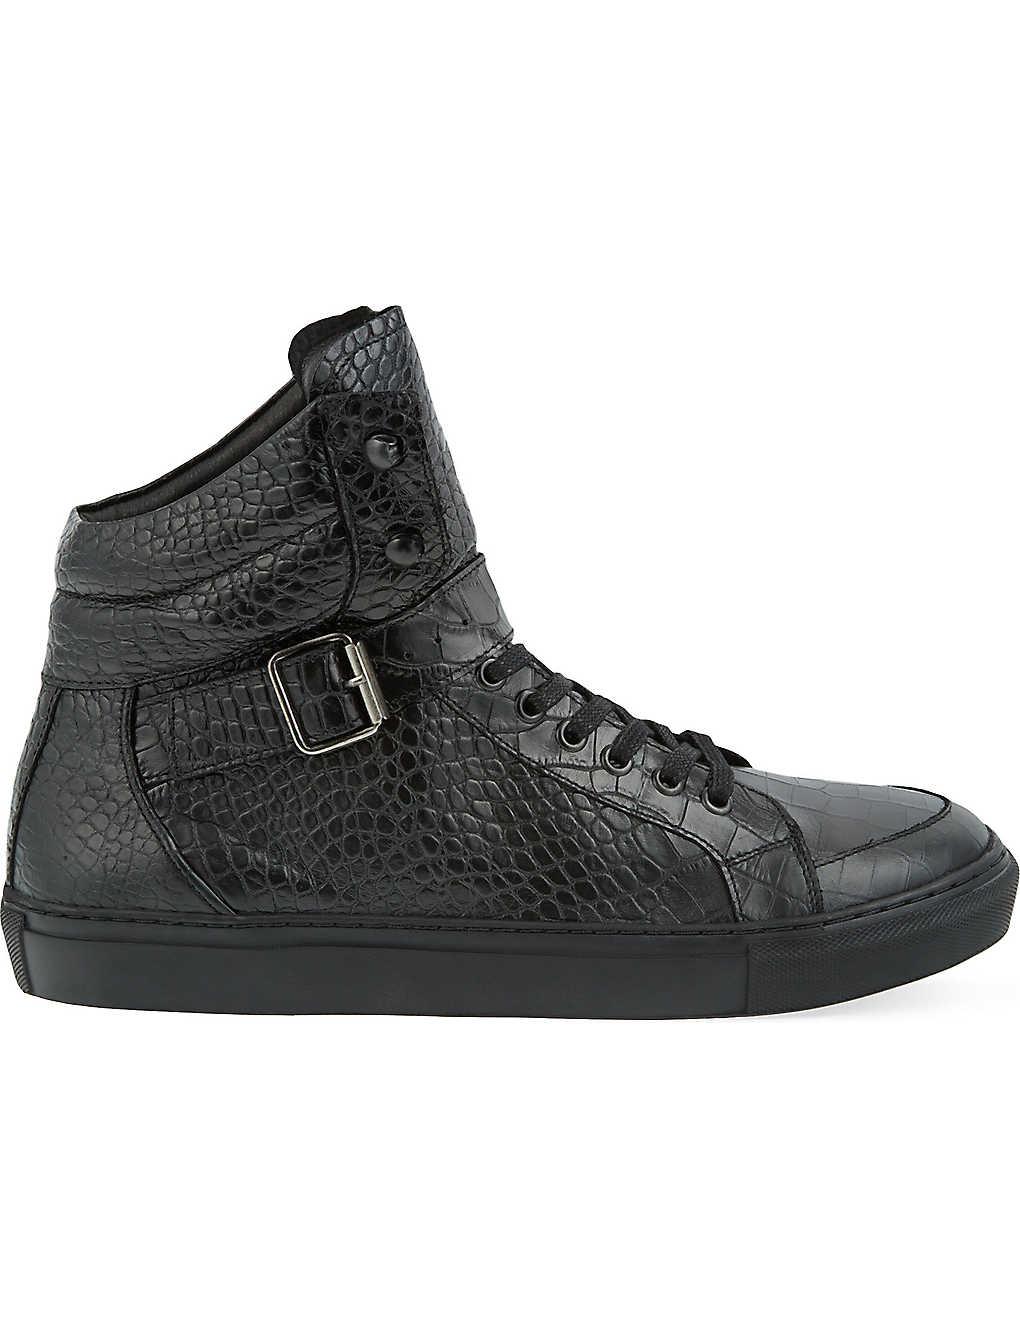 41682530d4 THE KOOPLES - Croc-embossed leather high-top trainers | Selfridges.com